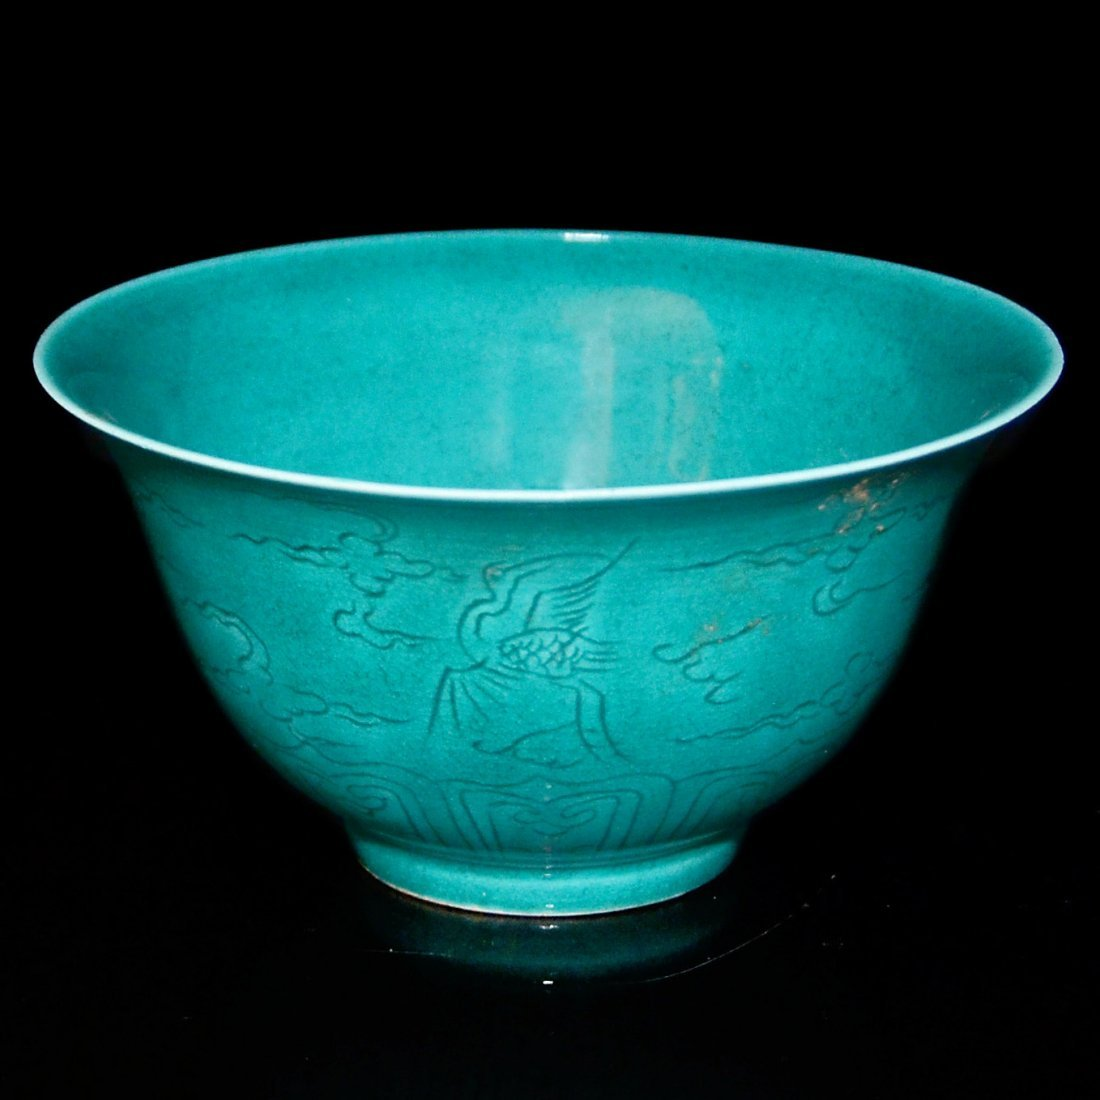 Ming, A Rare Peacock-Blue-Glazed Bowl